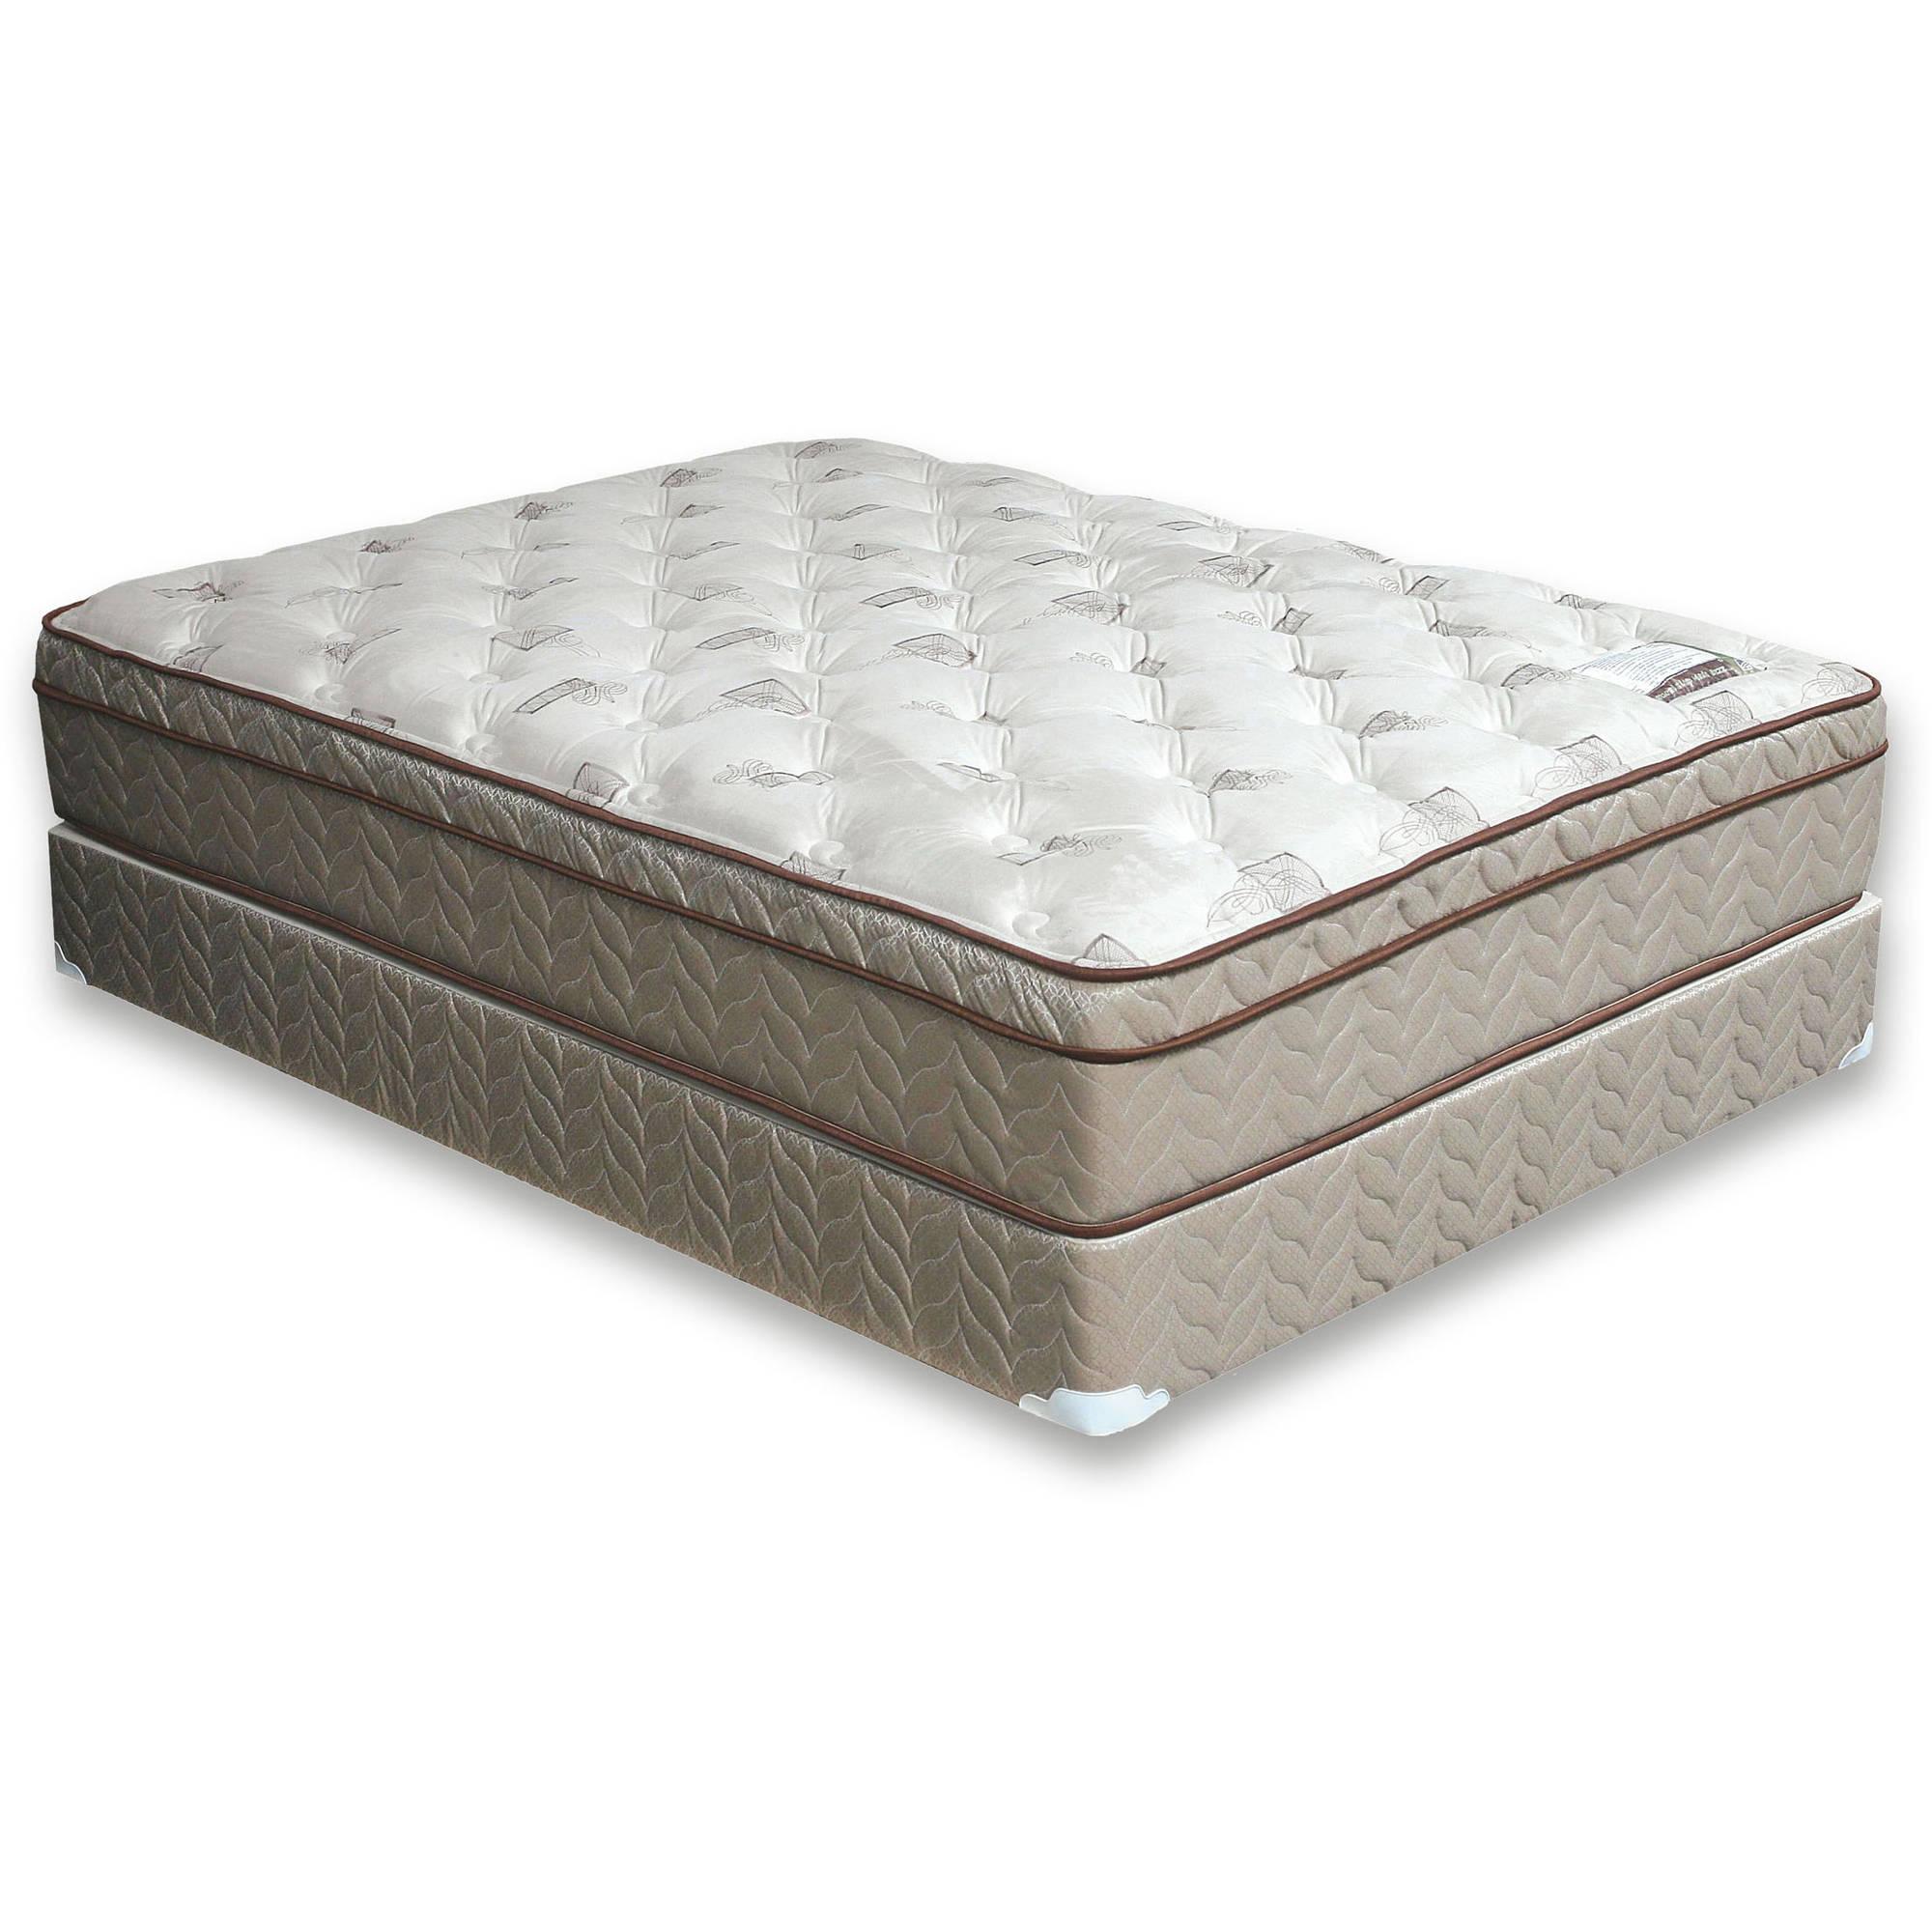 miBasics Trinity Euro Pillow-Top Mattress, Multiple Sizes